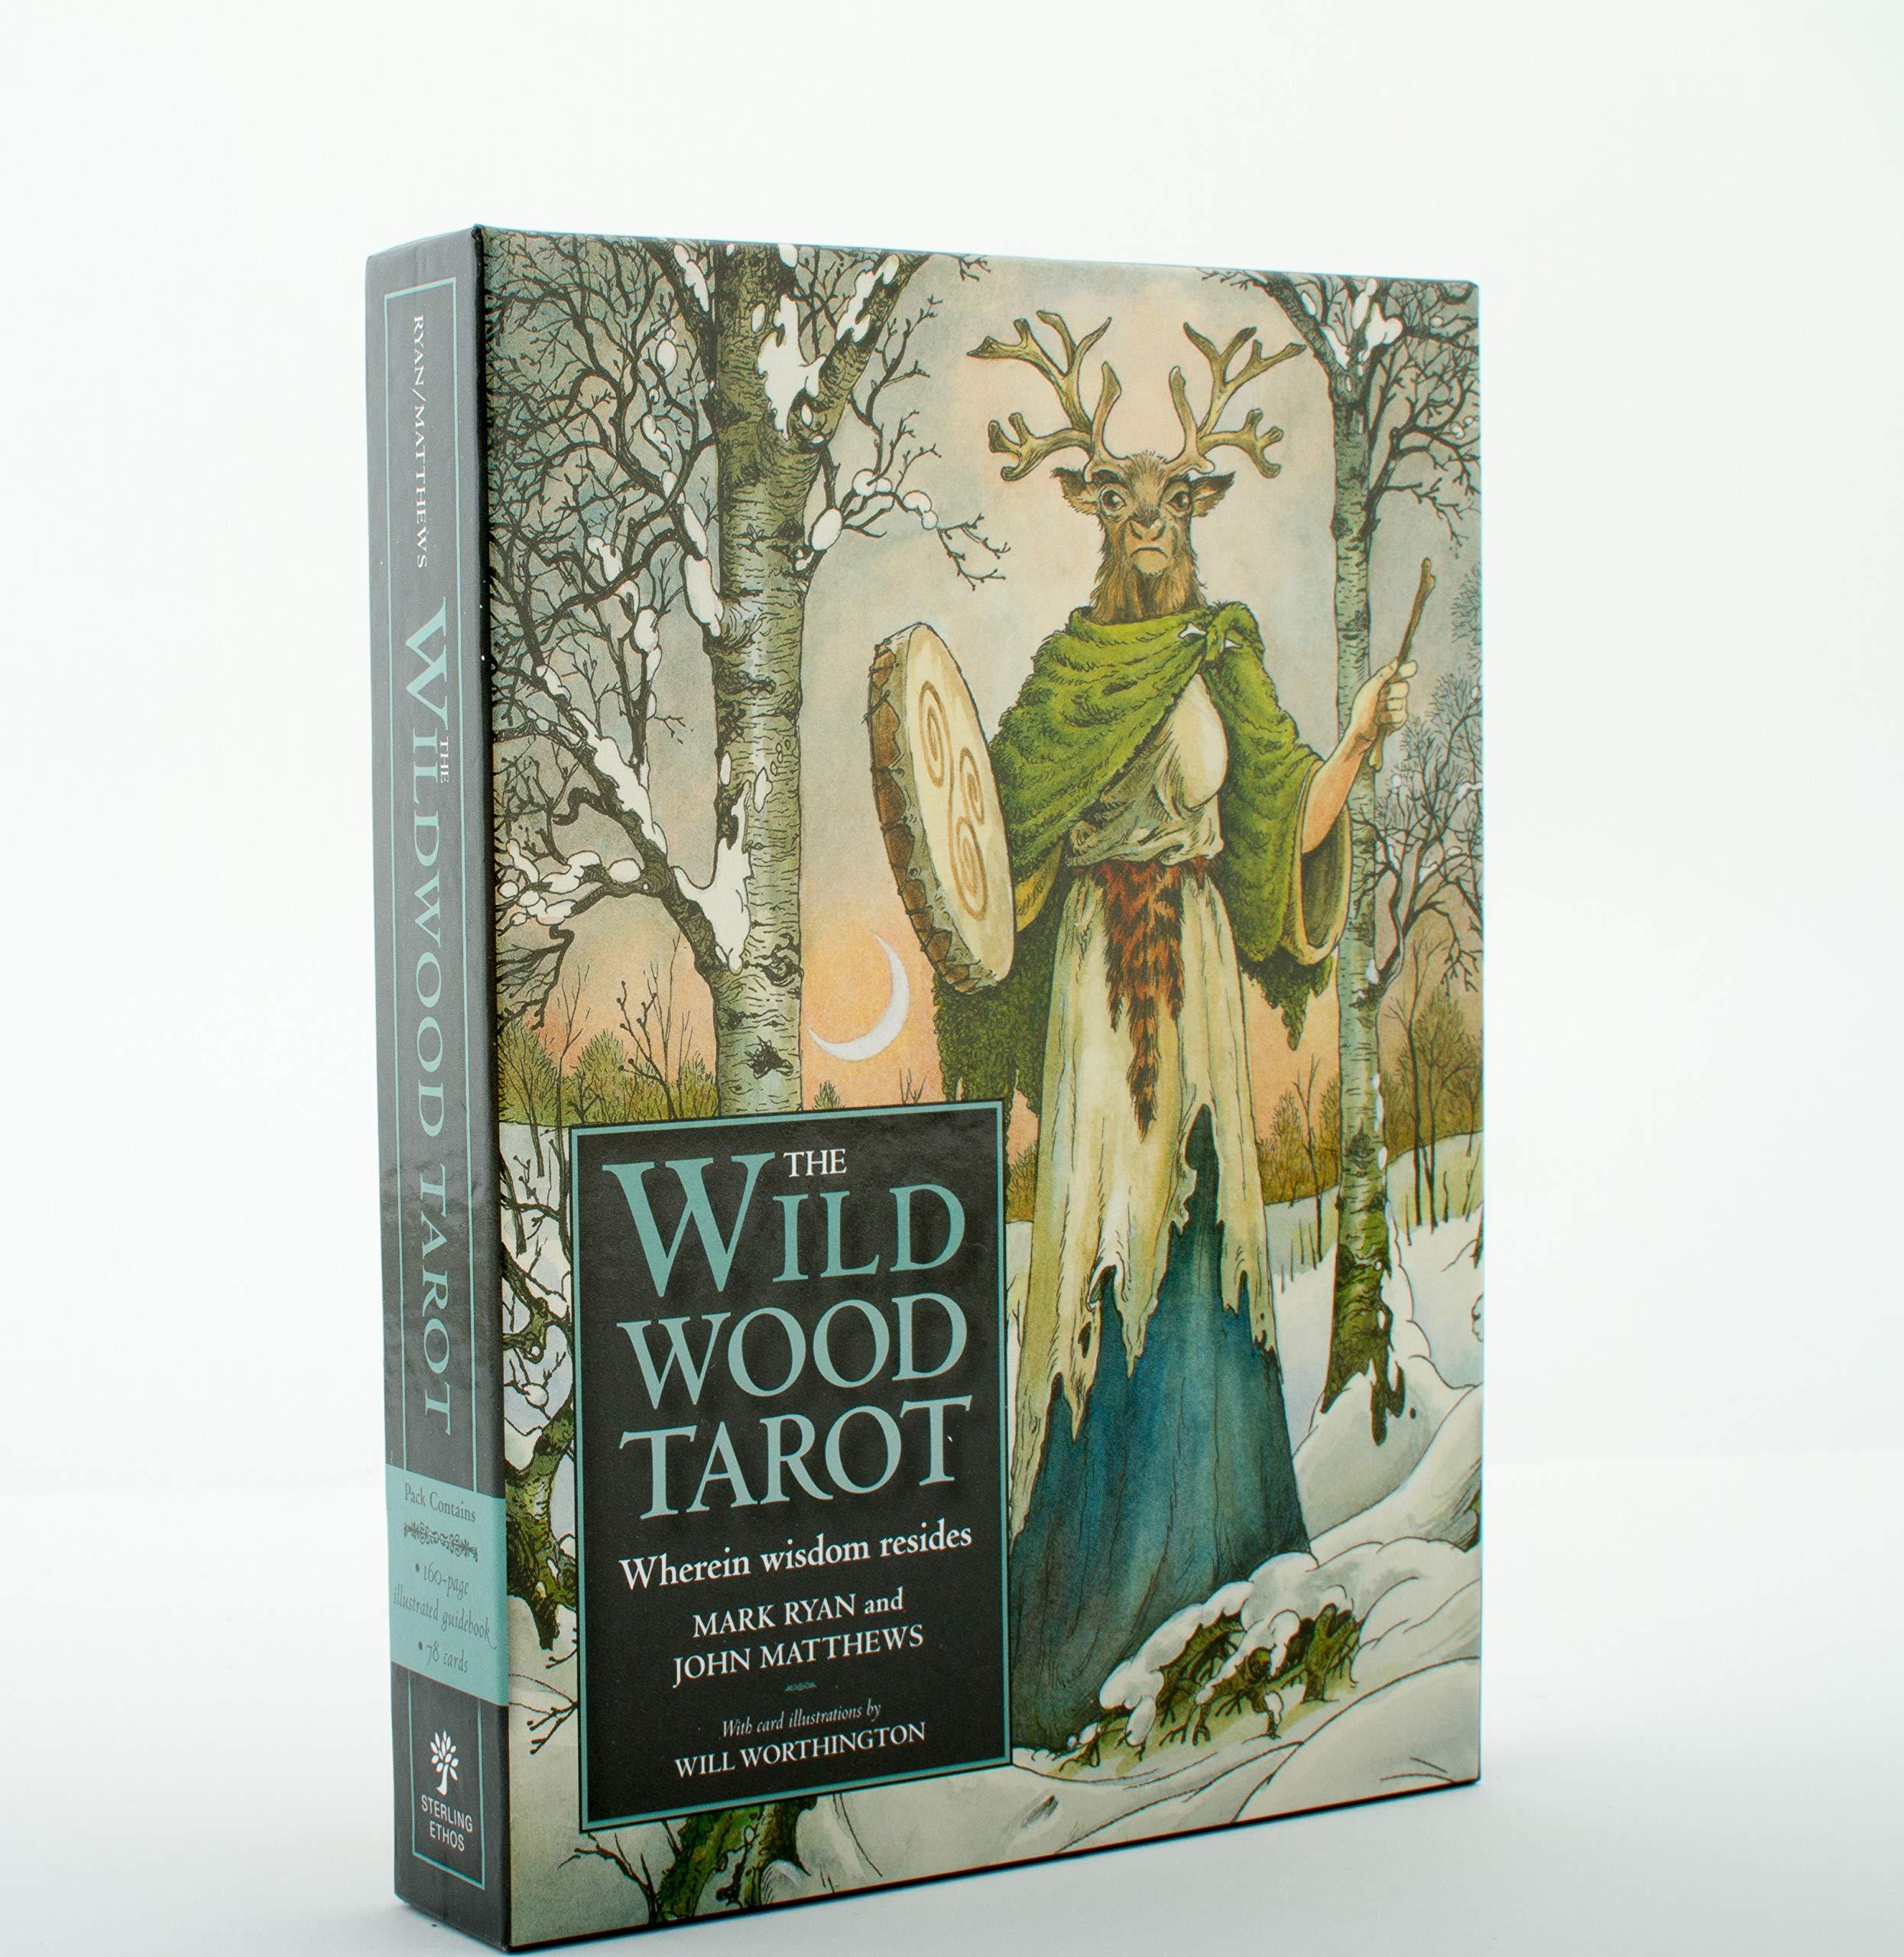 The Wildwood Tarot: Wherein Wisdom Resides: Ryan, Mark, Matthews, John,  Worthington, Will: 0616919036049: Books - Amazon.ca